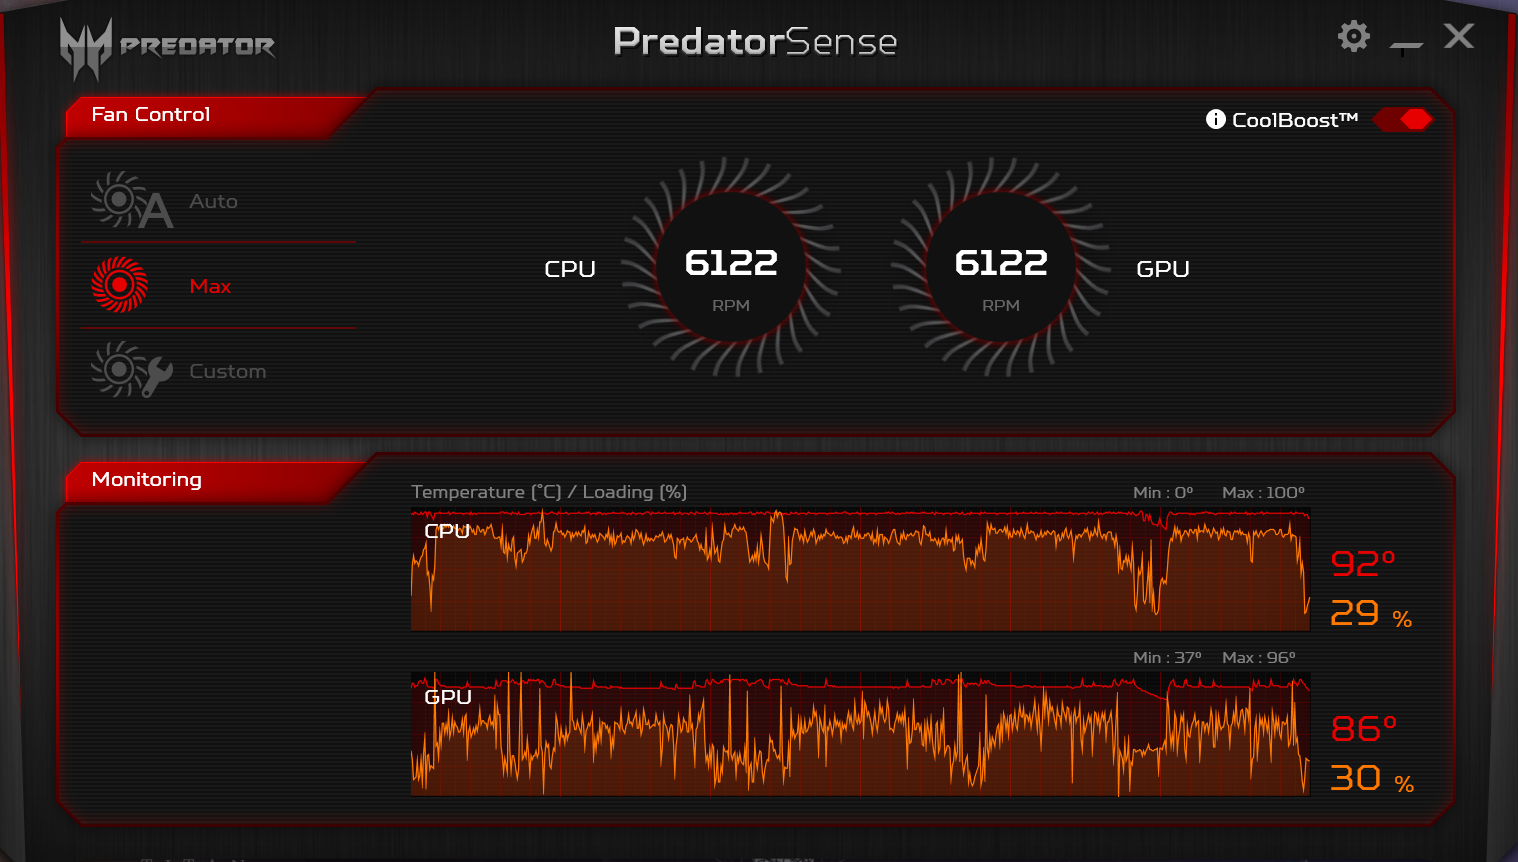 HEAT PROBLEM: Predator Helios 300 (8th Gen) i7-8750H & GTX 1060